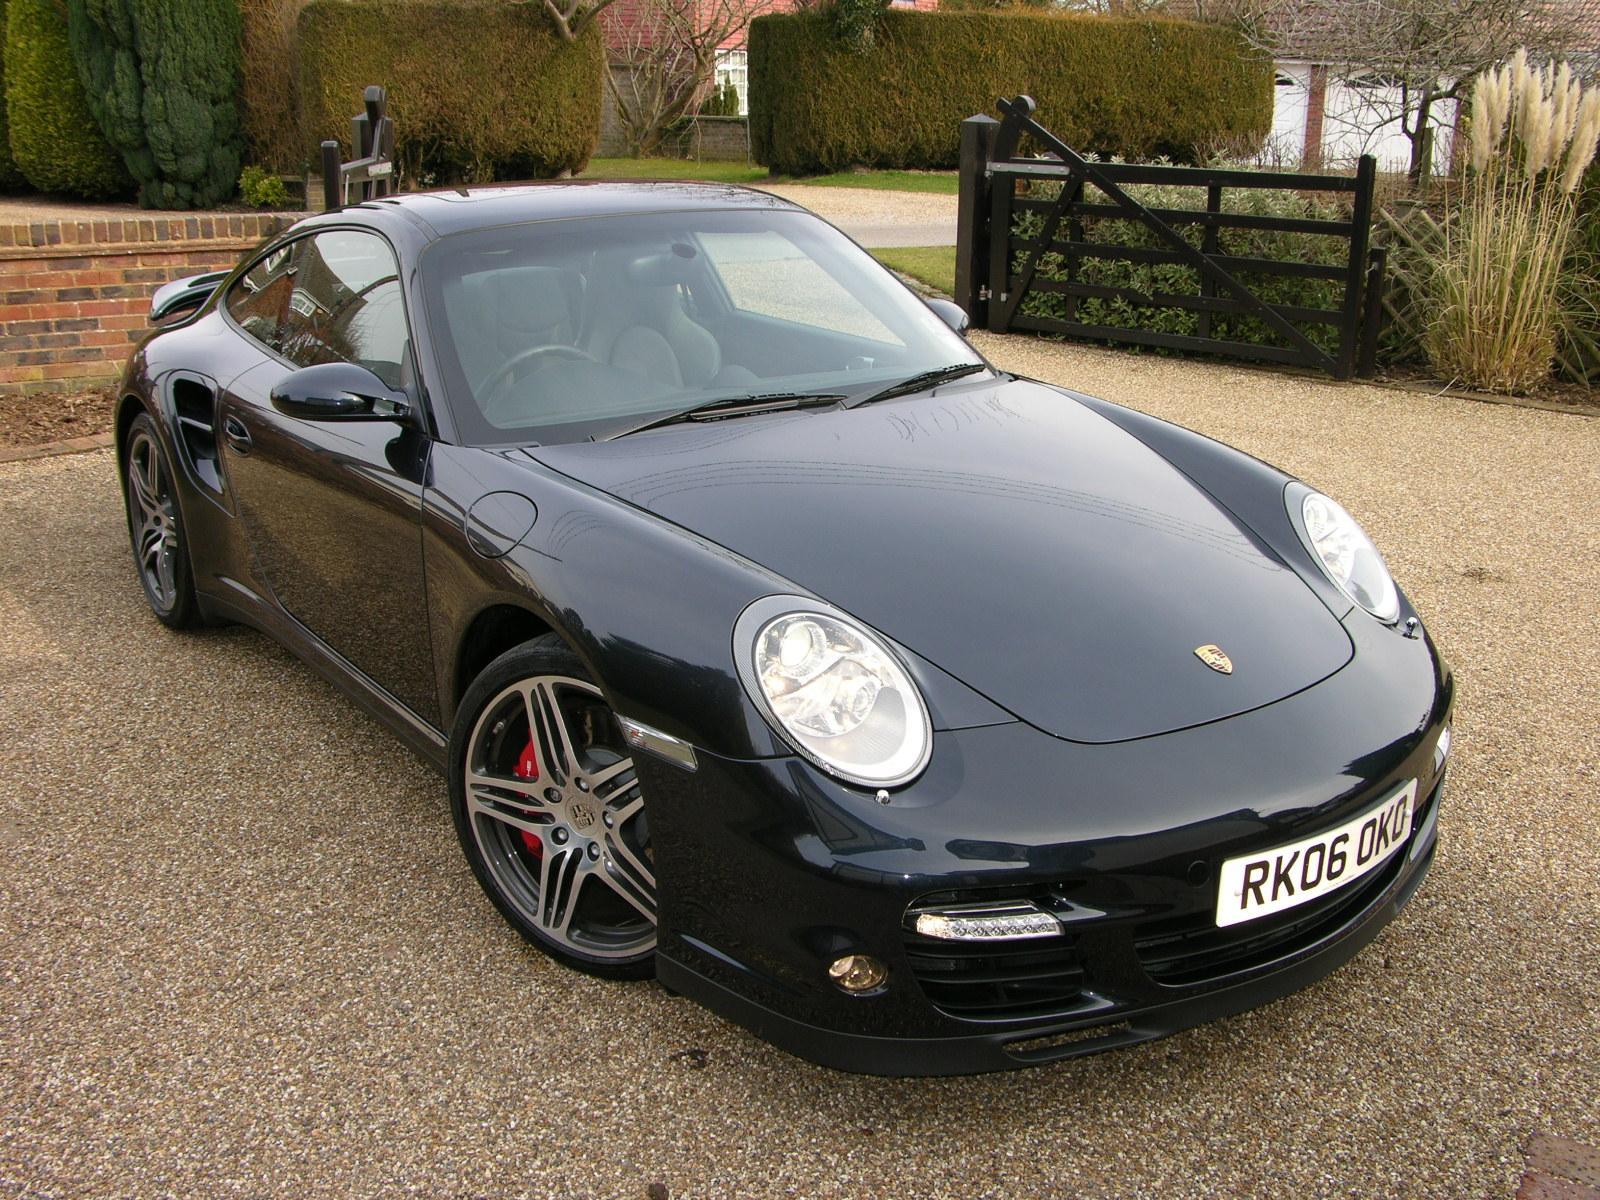 File 2006 Porsche 911 997 Turbo Flickr The Car Spy